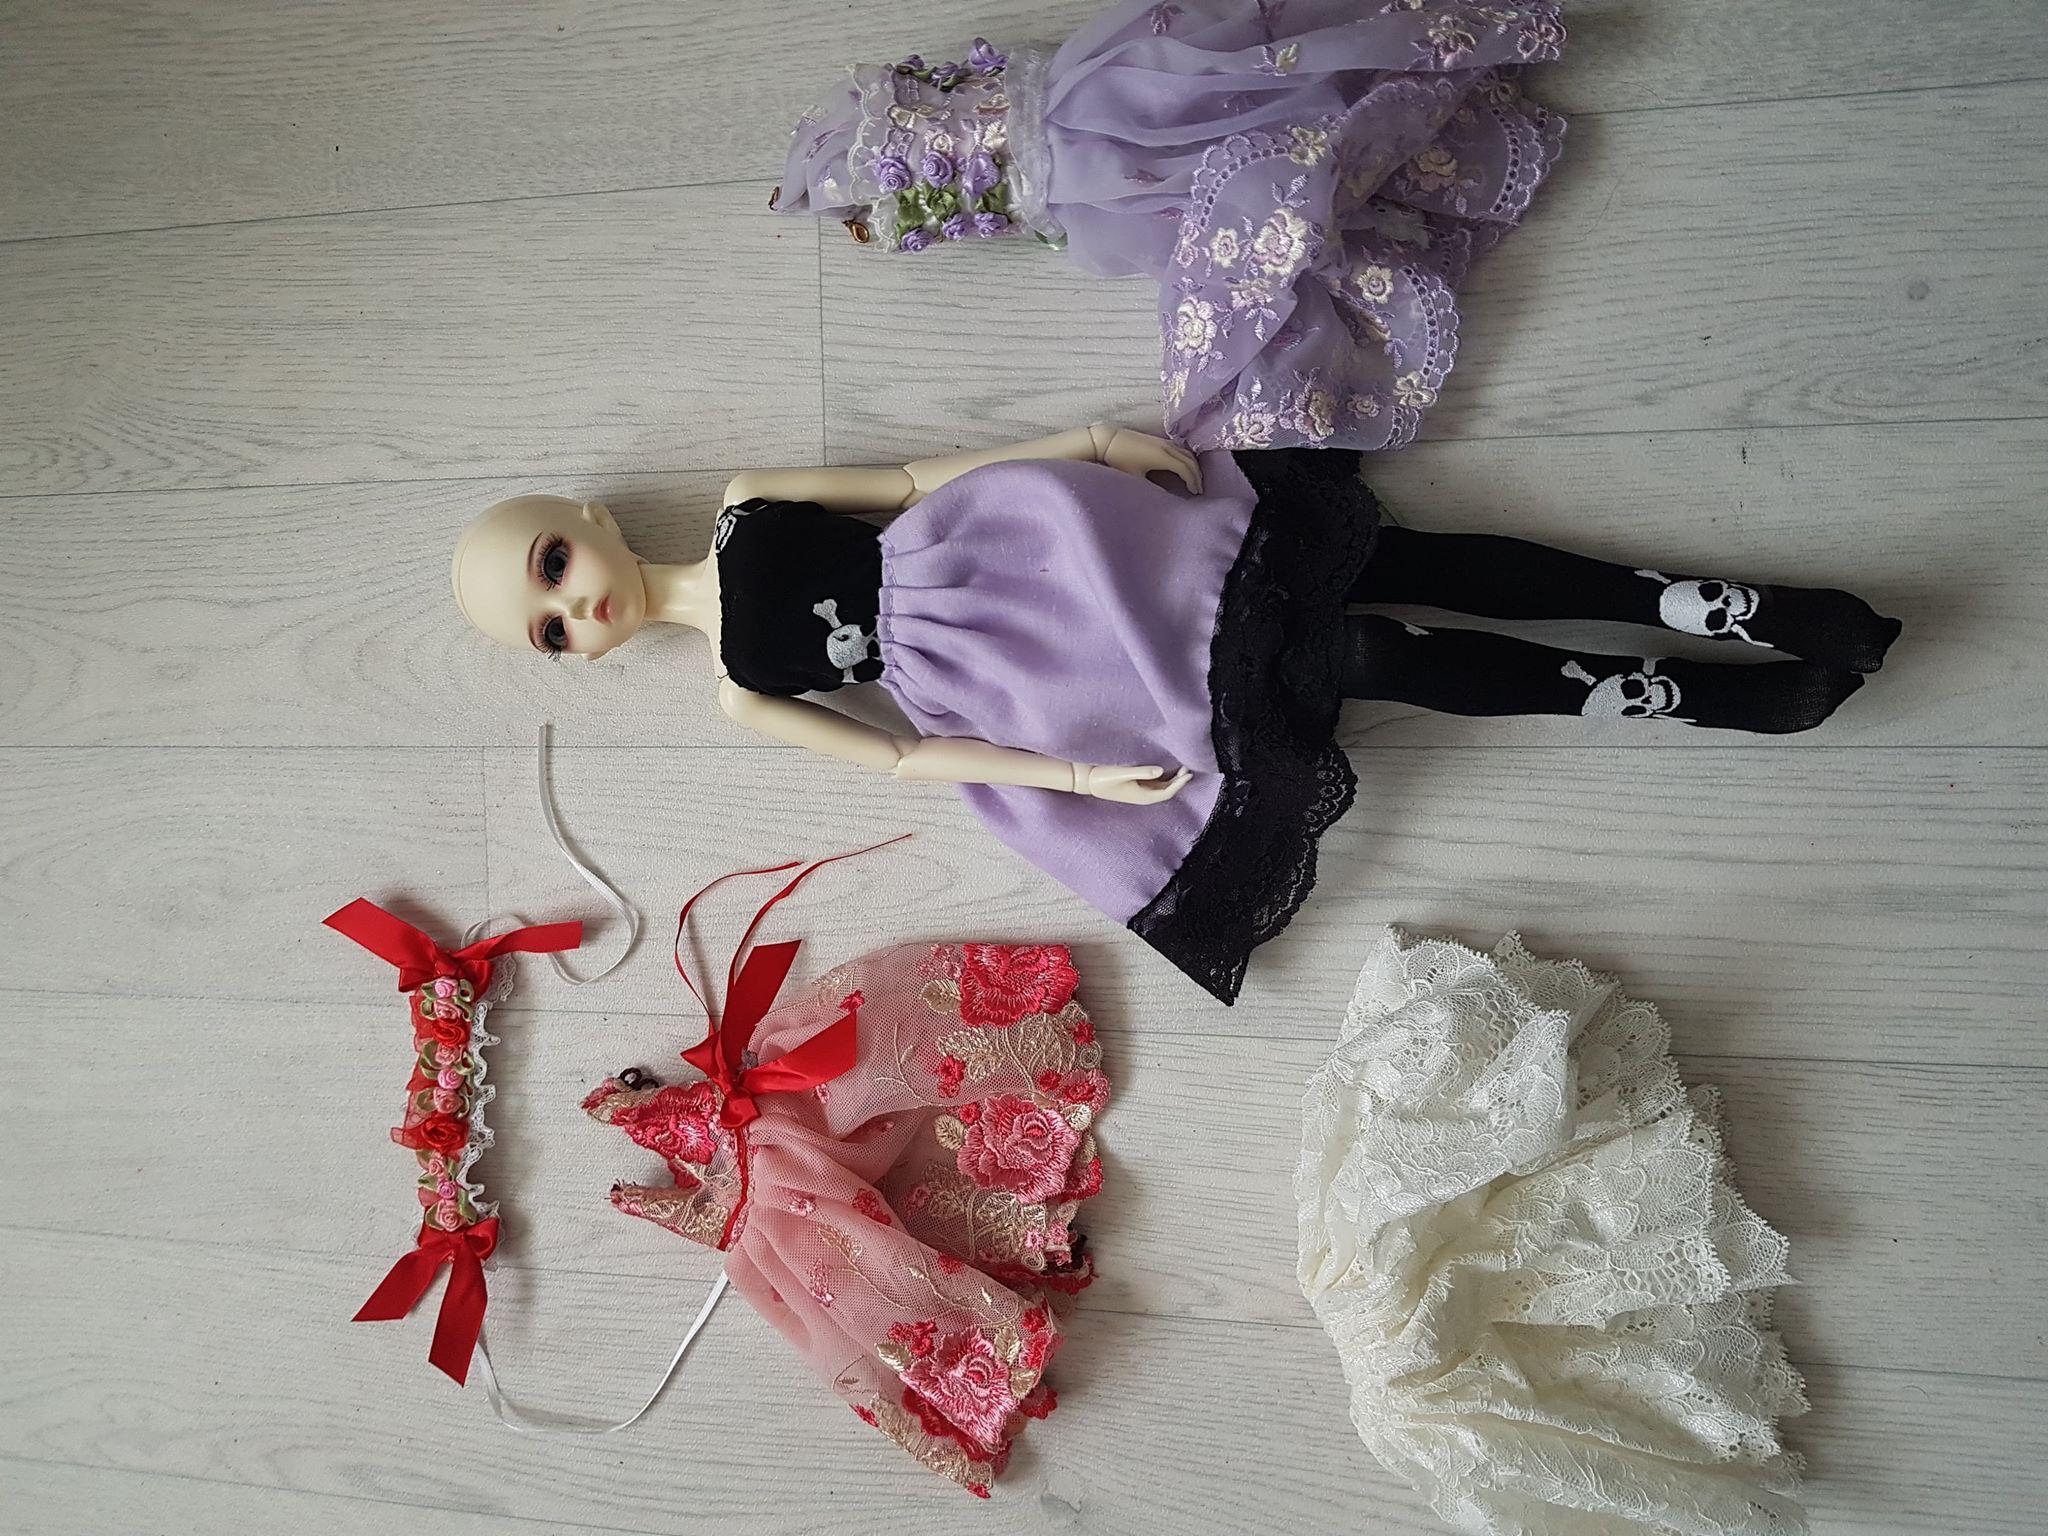 [VEND] BJD MSD Angel of Dream shangnai (150 euros) 18120601185610331